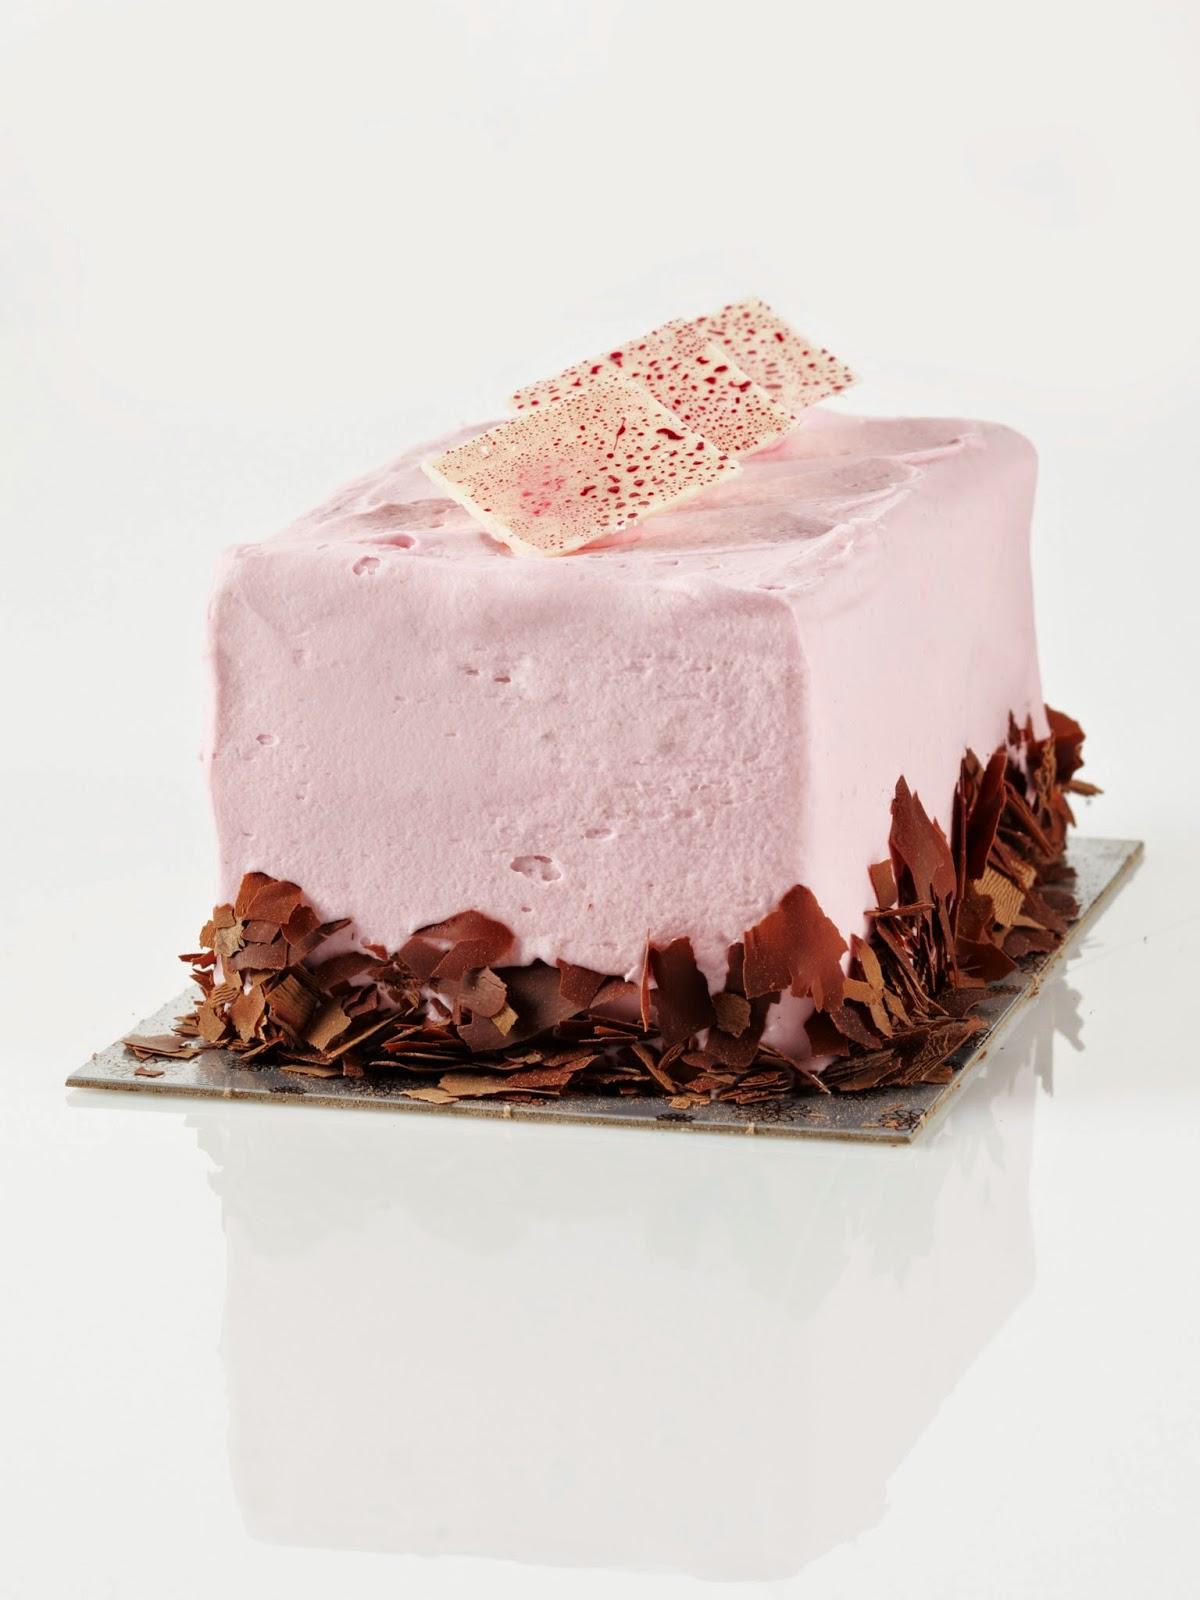 Dufflet Gluten Free Carrot Cake